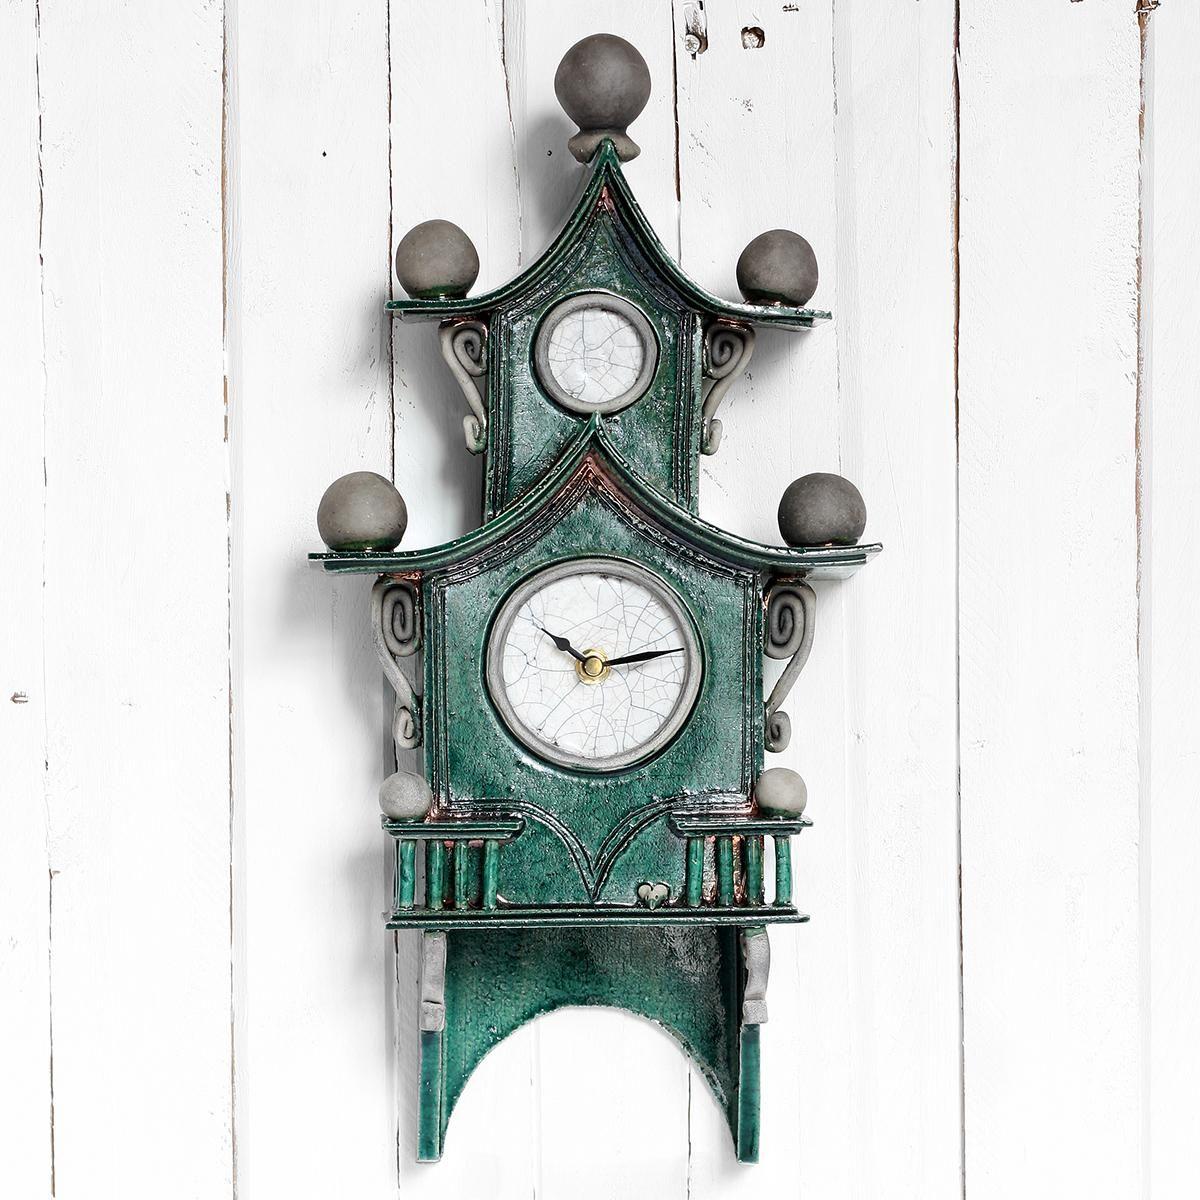 Quirky Ceramic Two Tier Pendulum Wall Clock Emerald Green By Ian